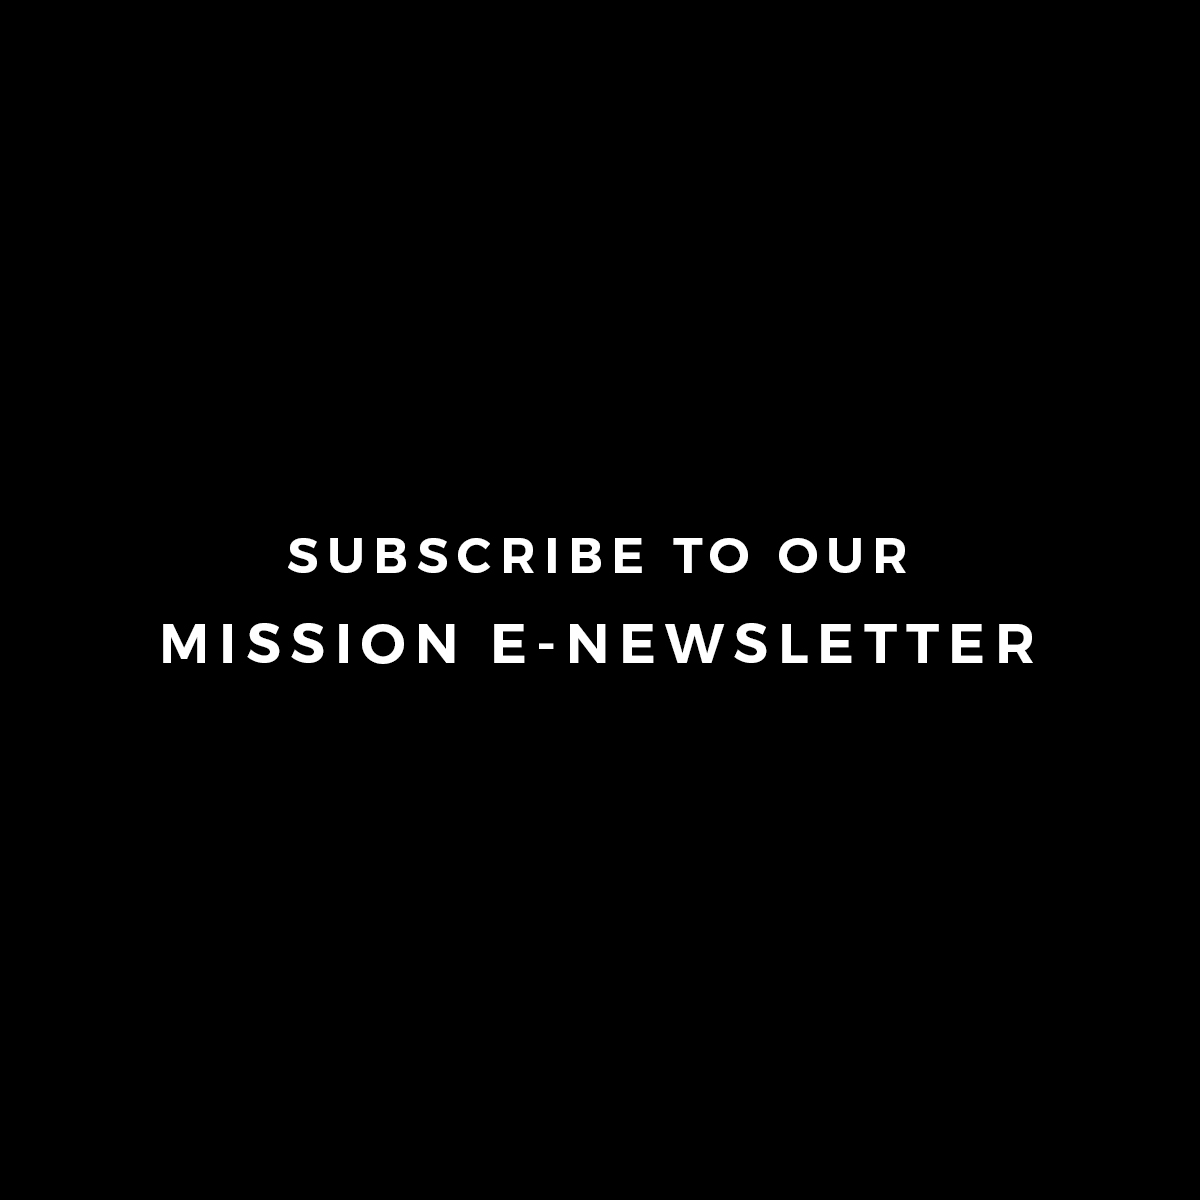 mission_newsletter_block.jpg